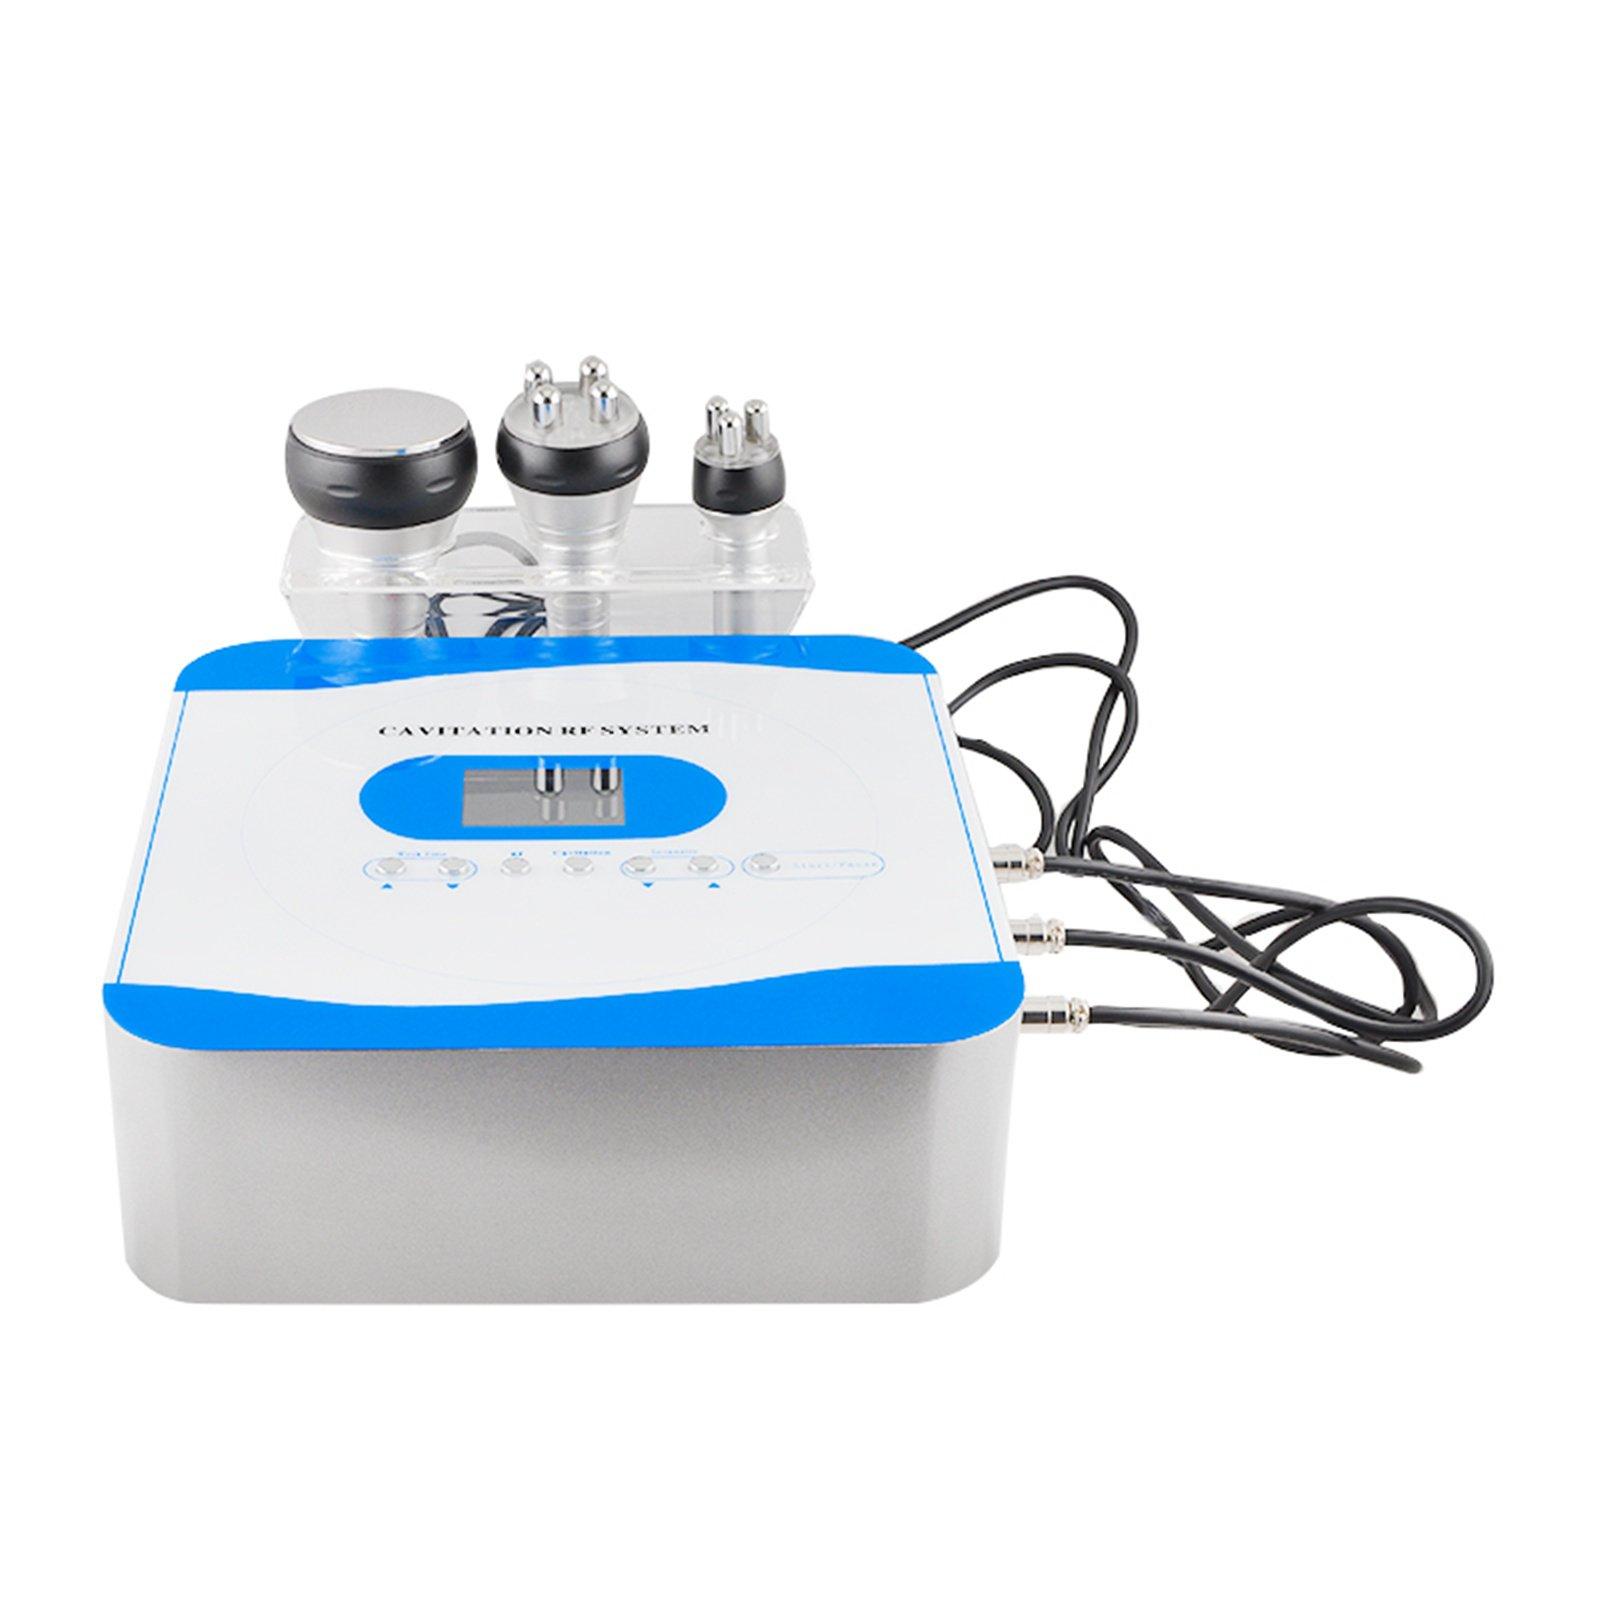 Denshine® 3 In1 40khz Cavitation Radio Frequency Slim Fat Burning Machine Massager